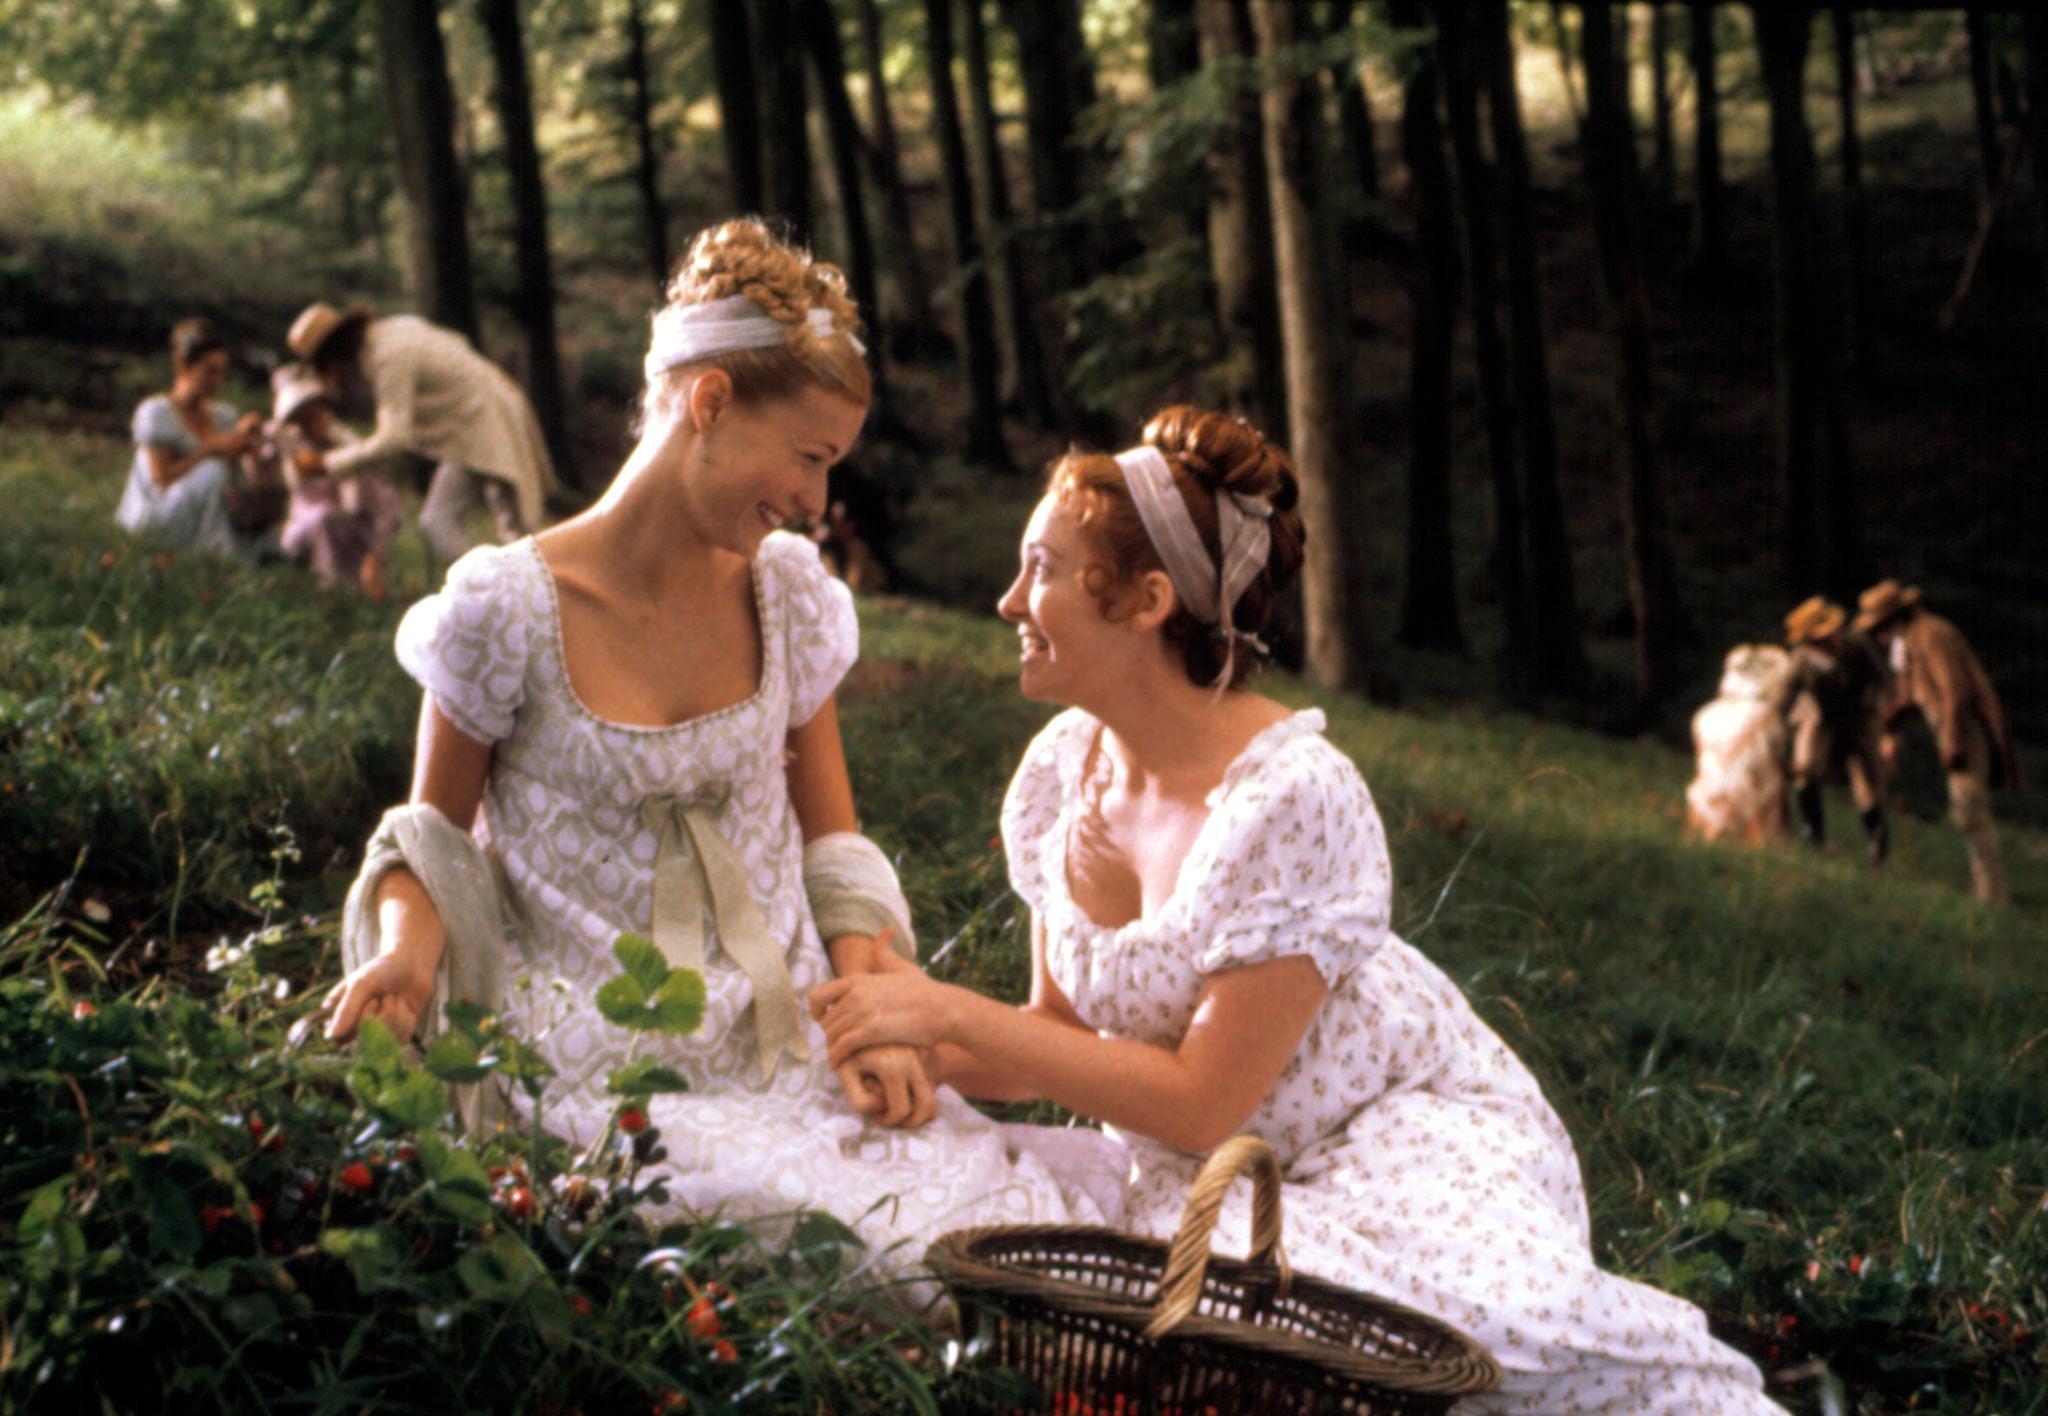 The secret 'snog' in Jane Austen revealed   The Independent